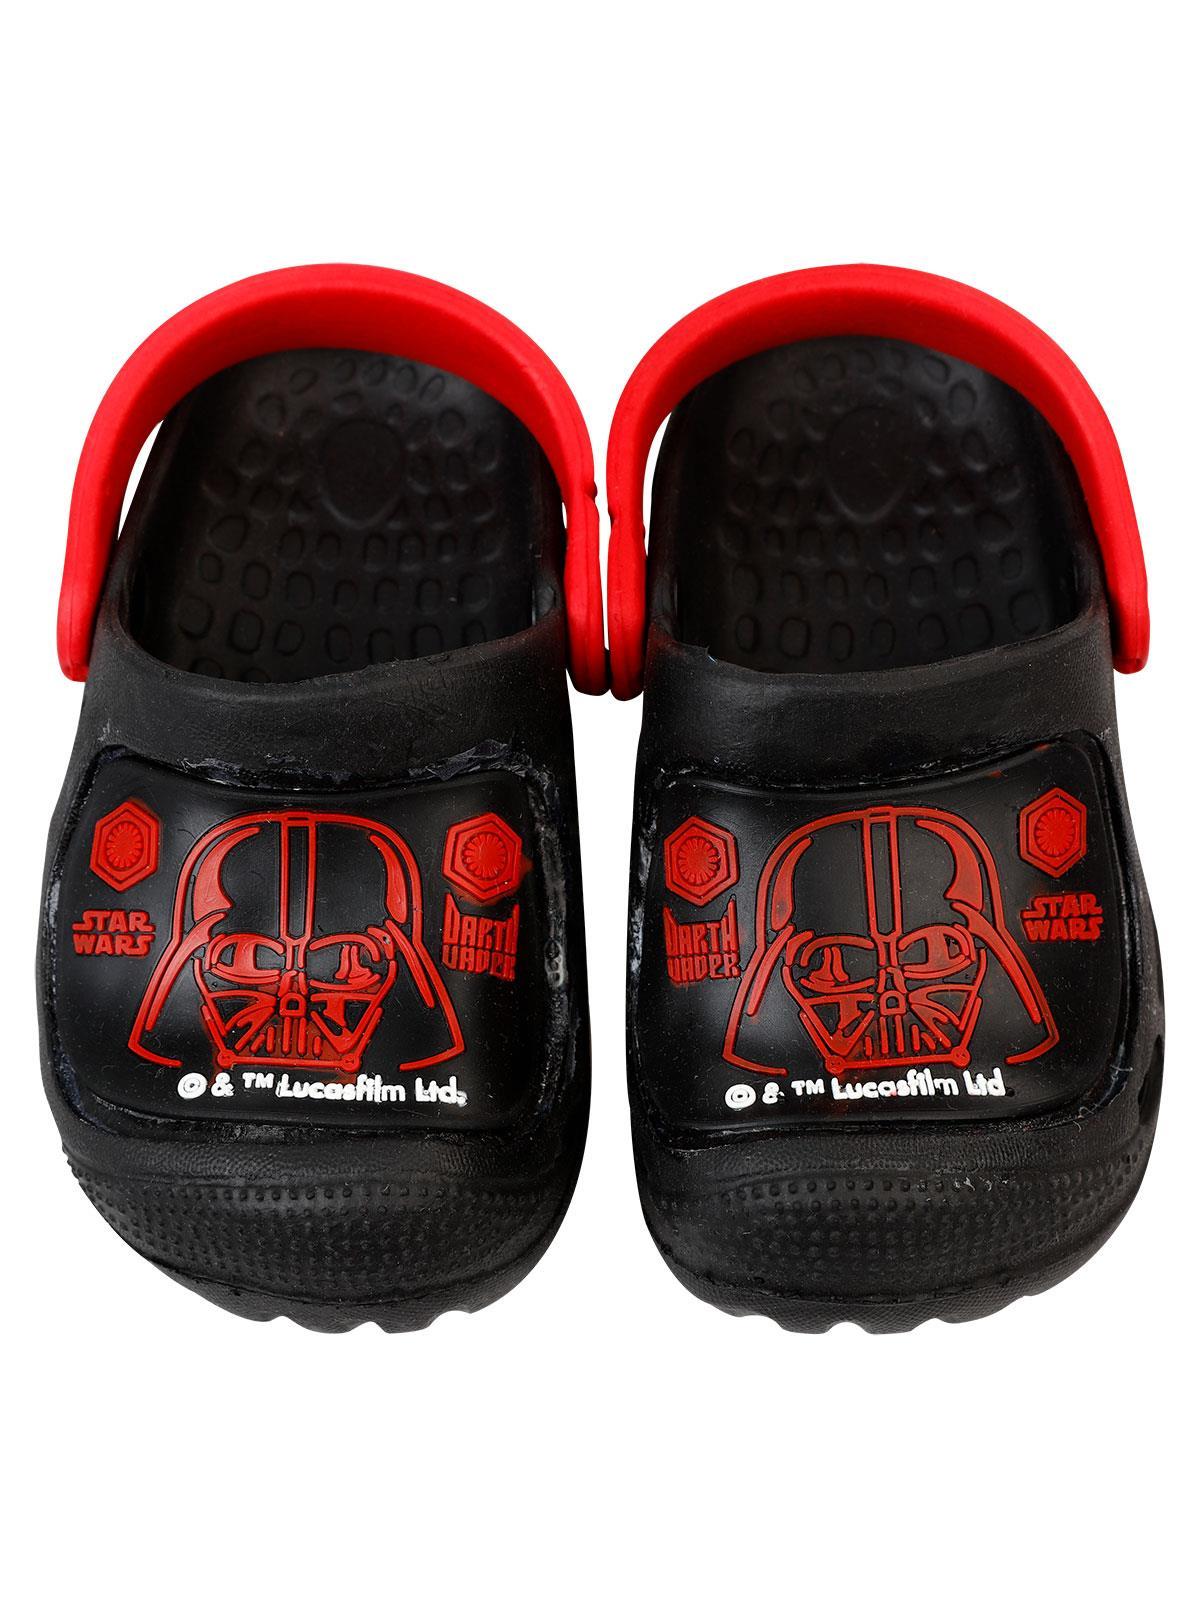 2020 summer boys girls slippers home kids outdoors beach pool Sandals soft non-slip bath slippers Crocs Slippers 22-27 size